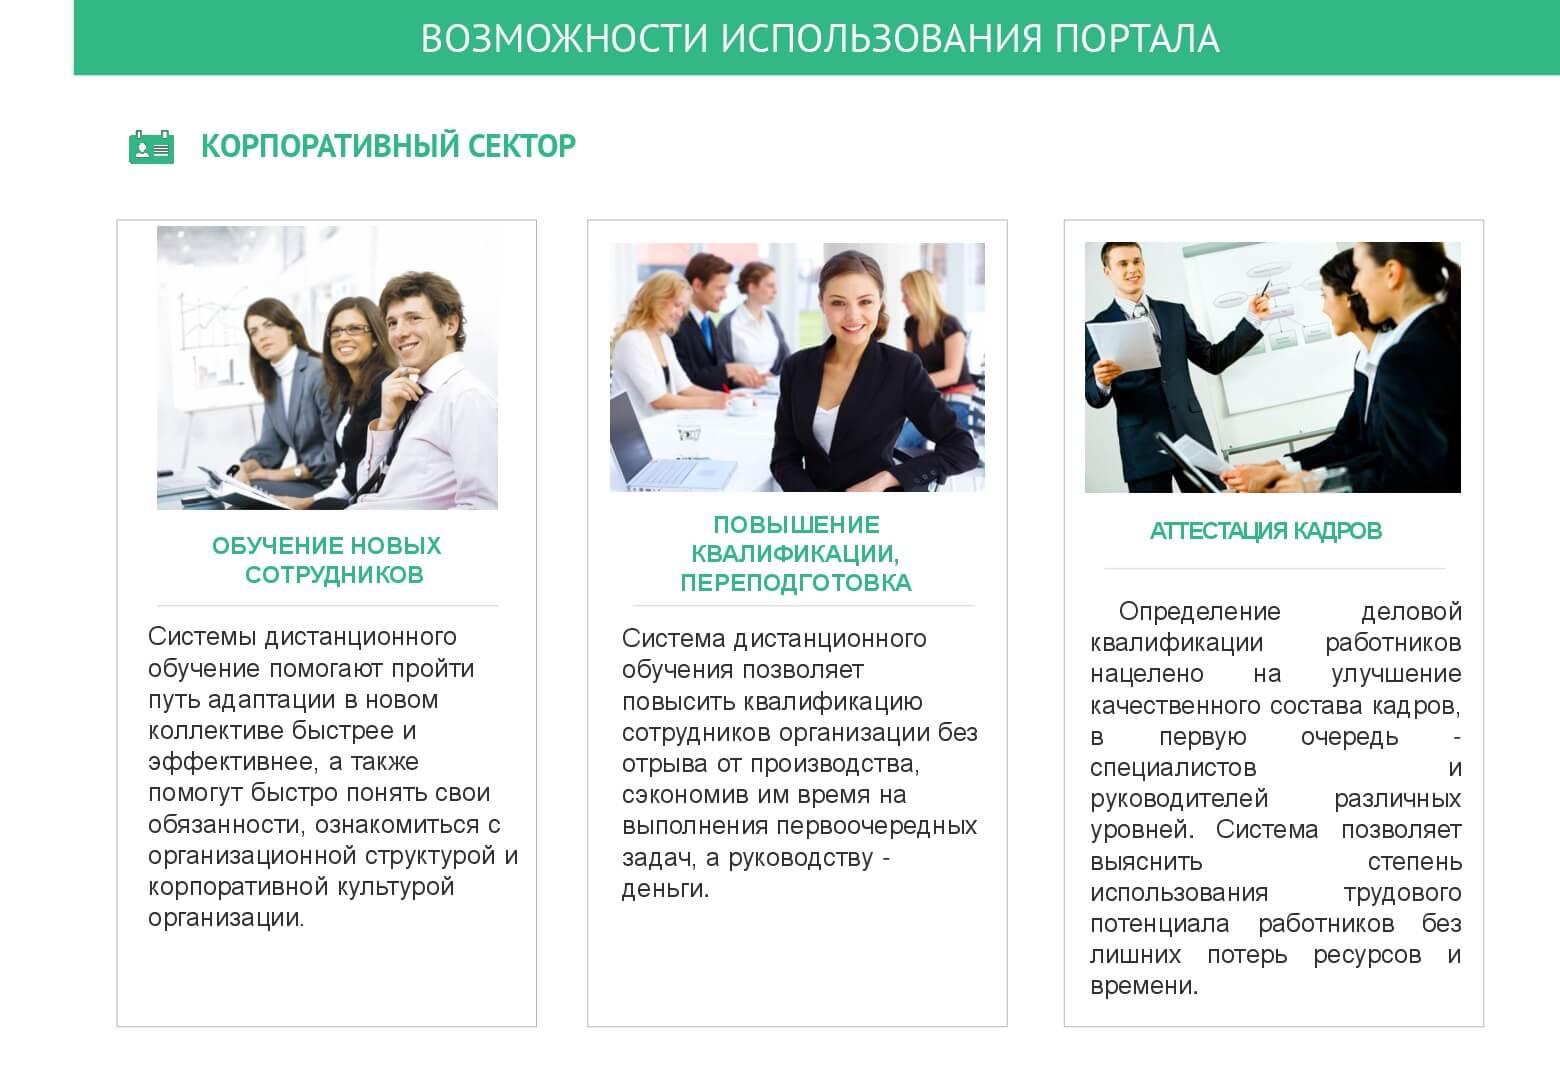 13_pdfsam_pres_SDO_23.10.13_v3